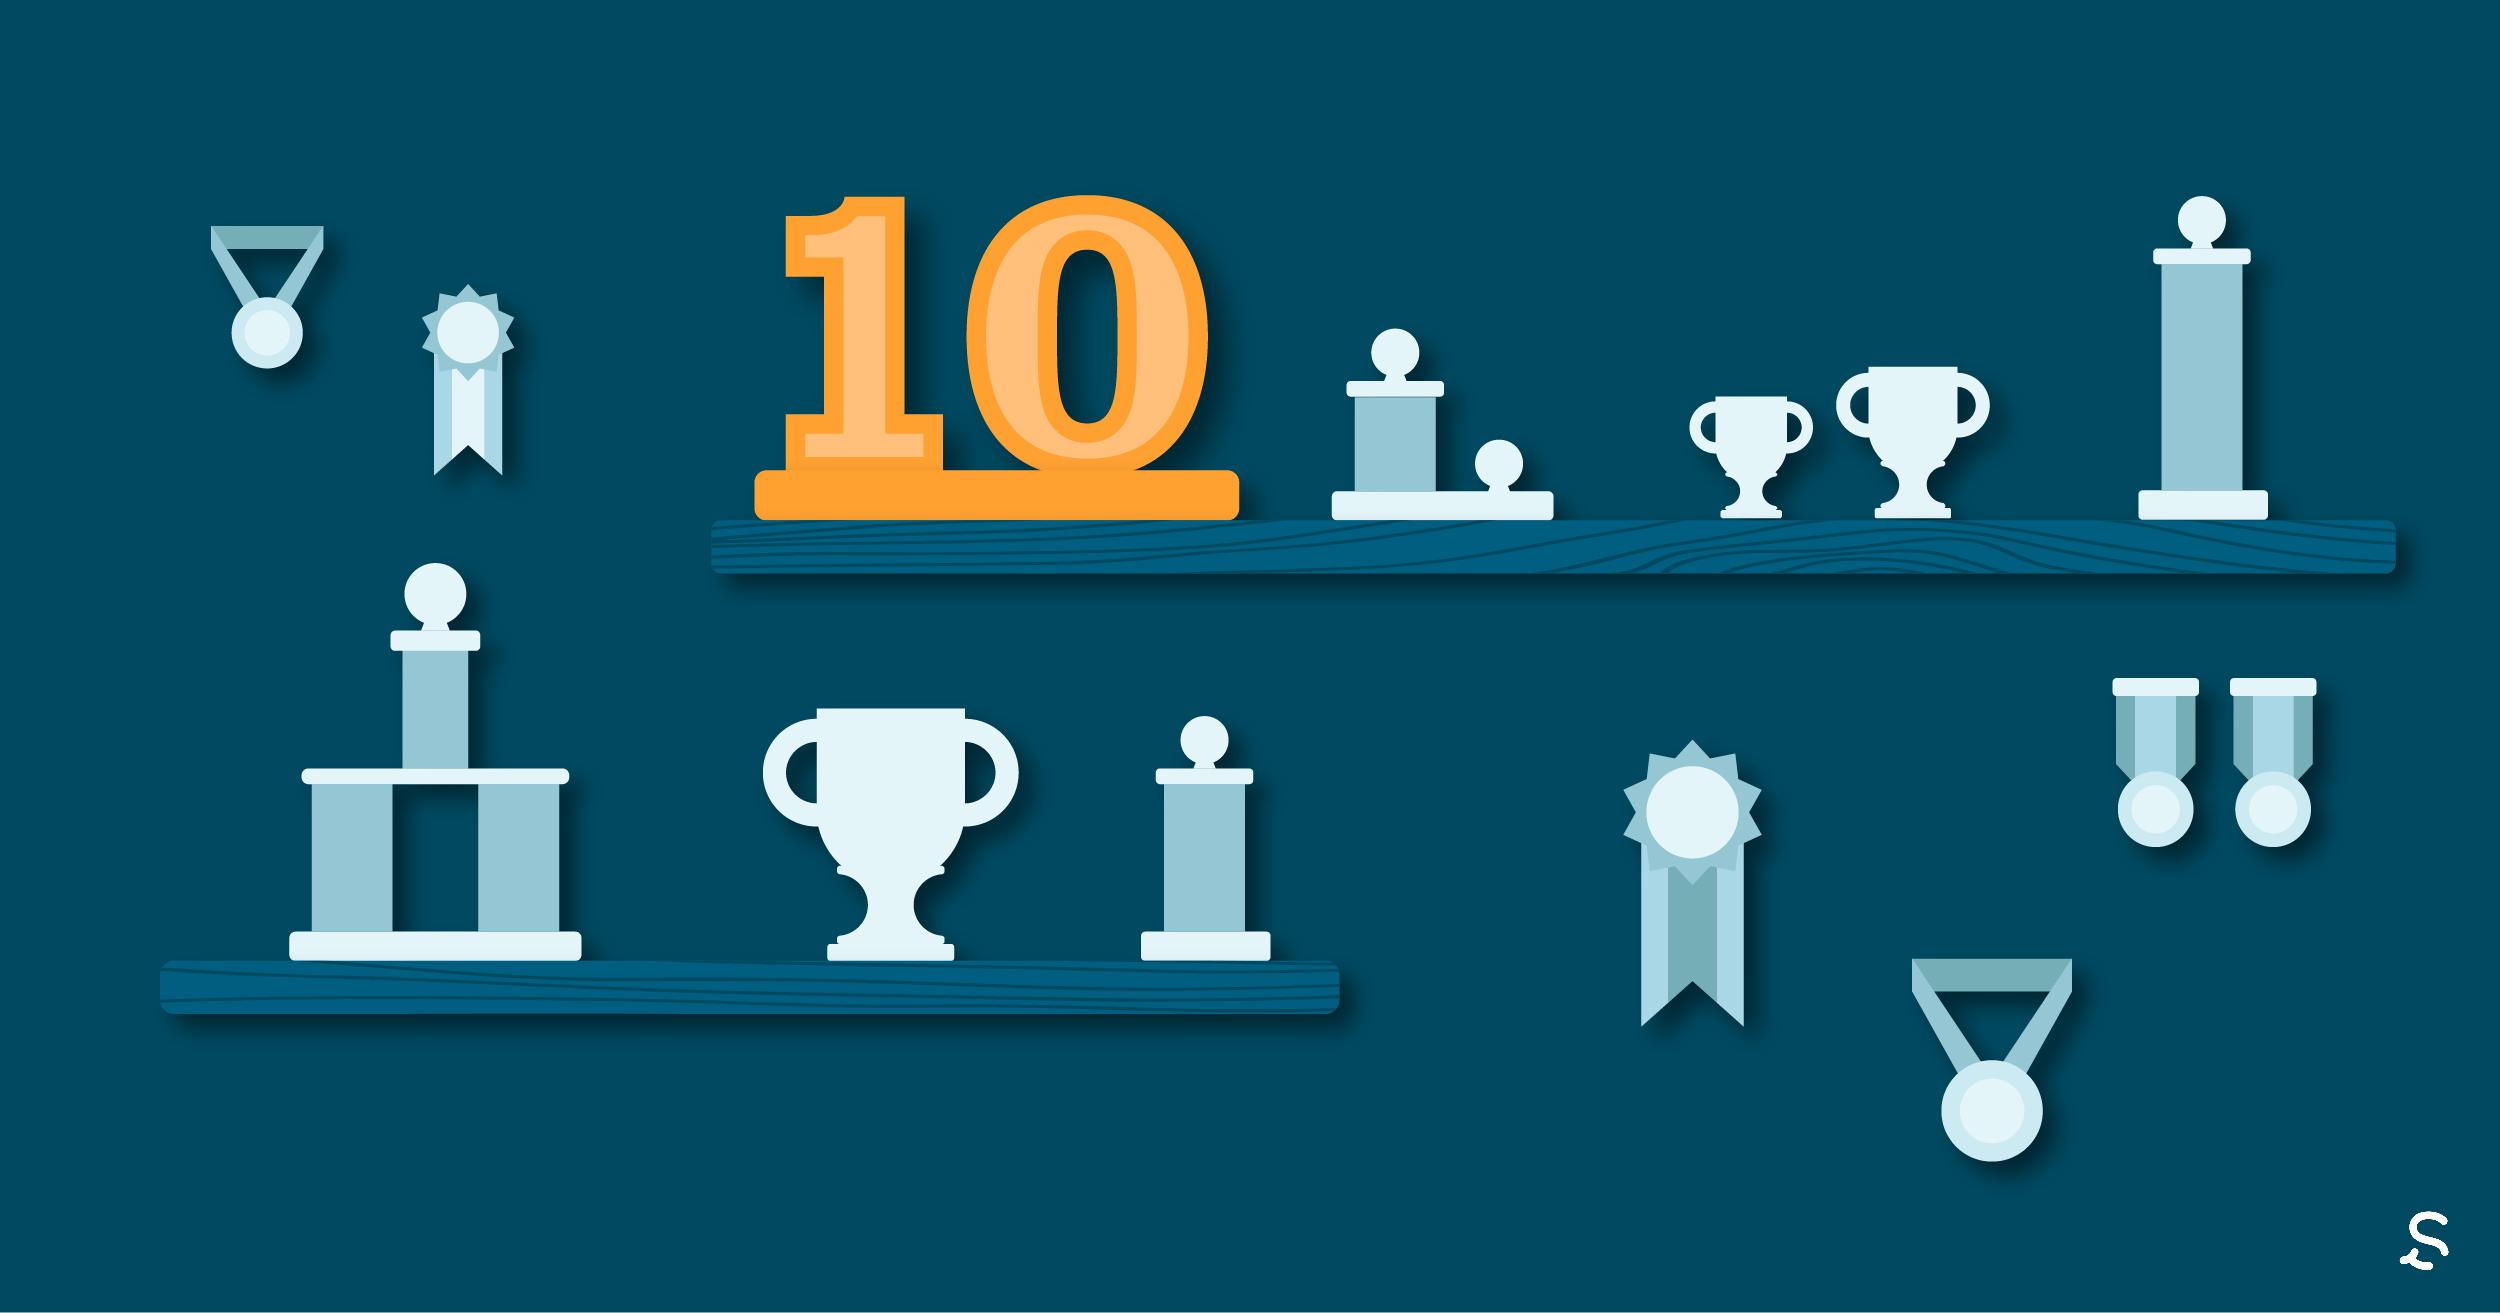 10 ways to build brand trust